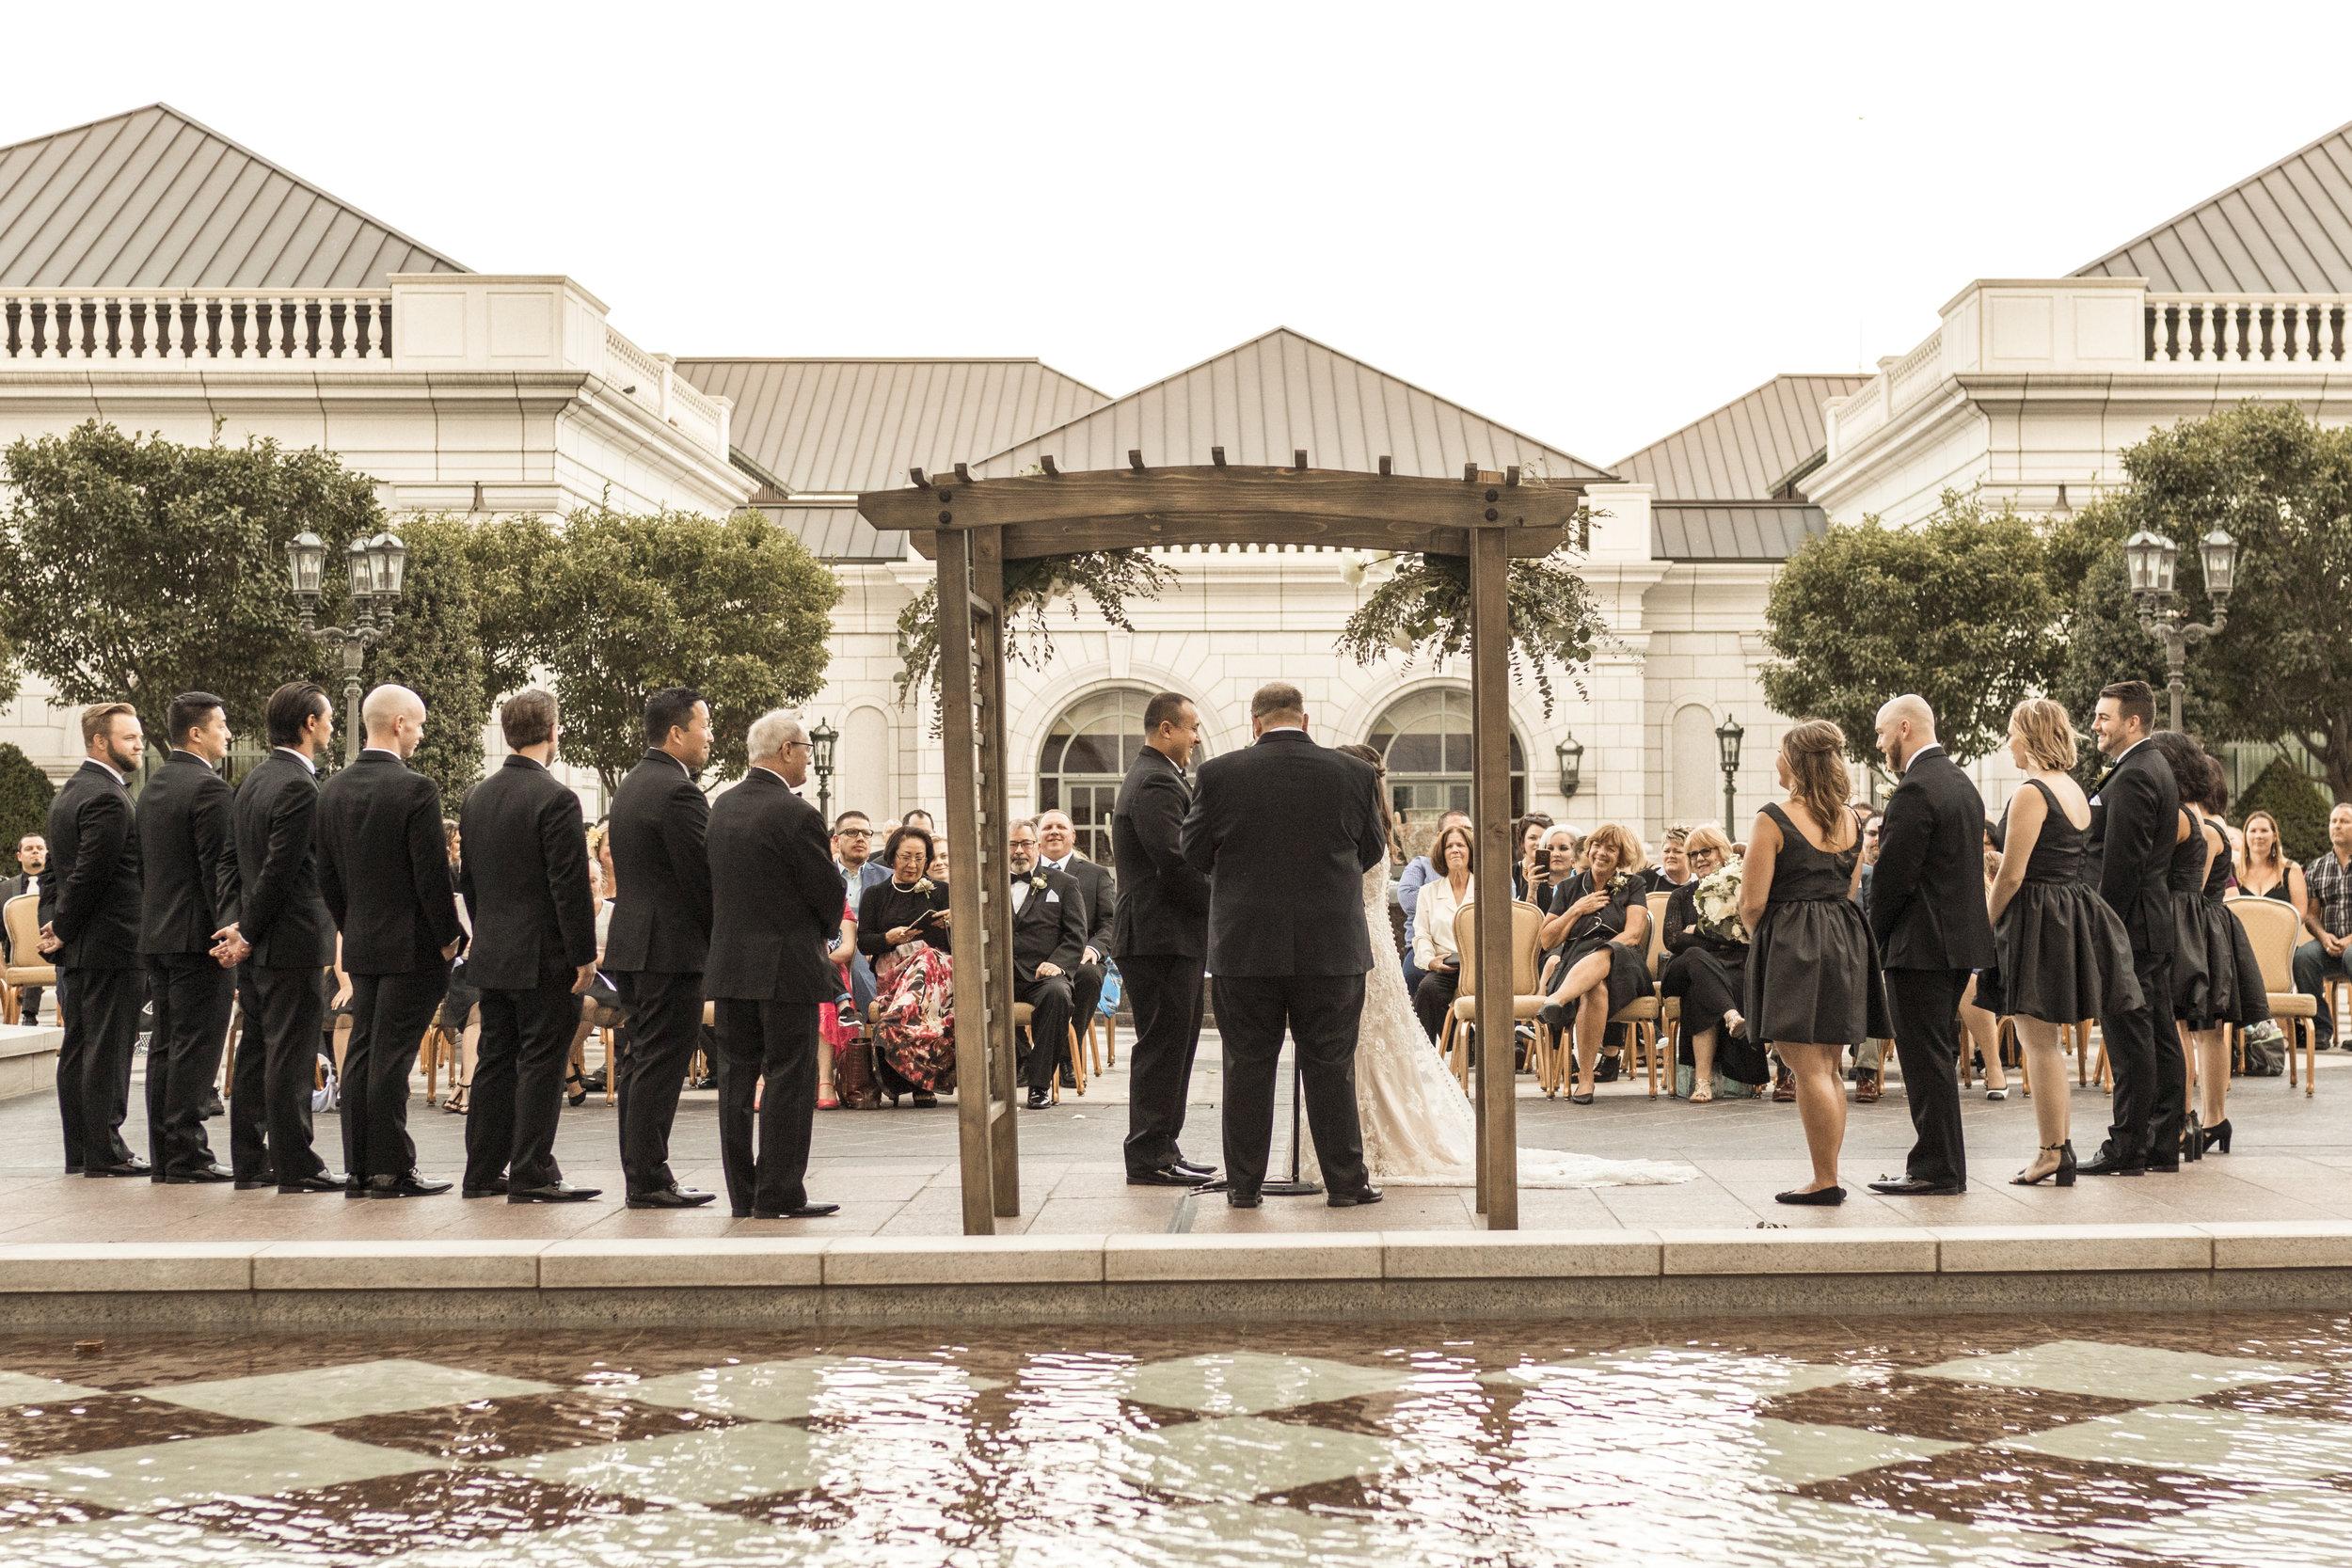 Grand America Hotel High End Wedding  Salt Lake City, Utah   Bri Bergman Photography 028.JPG